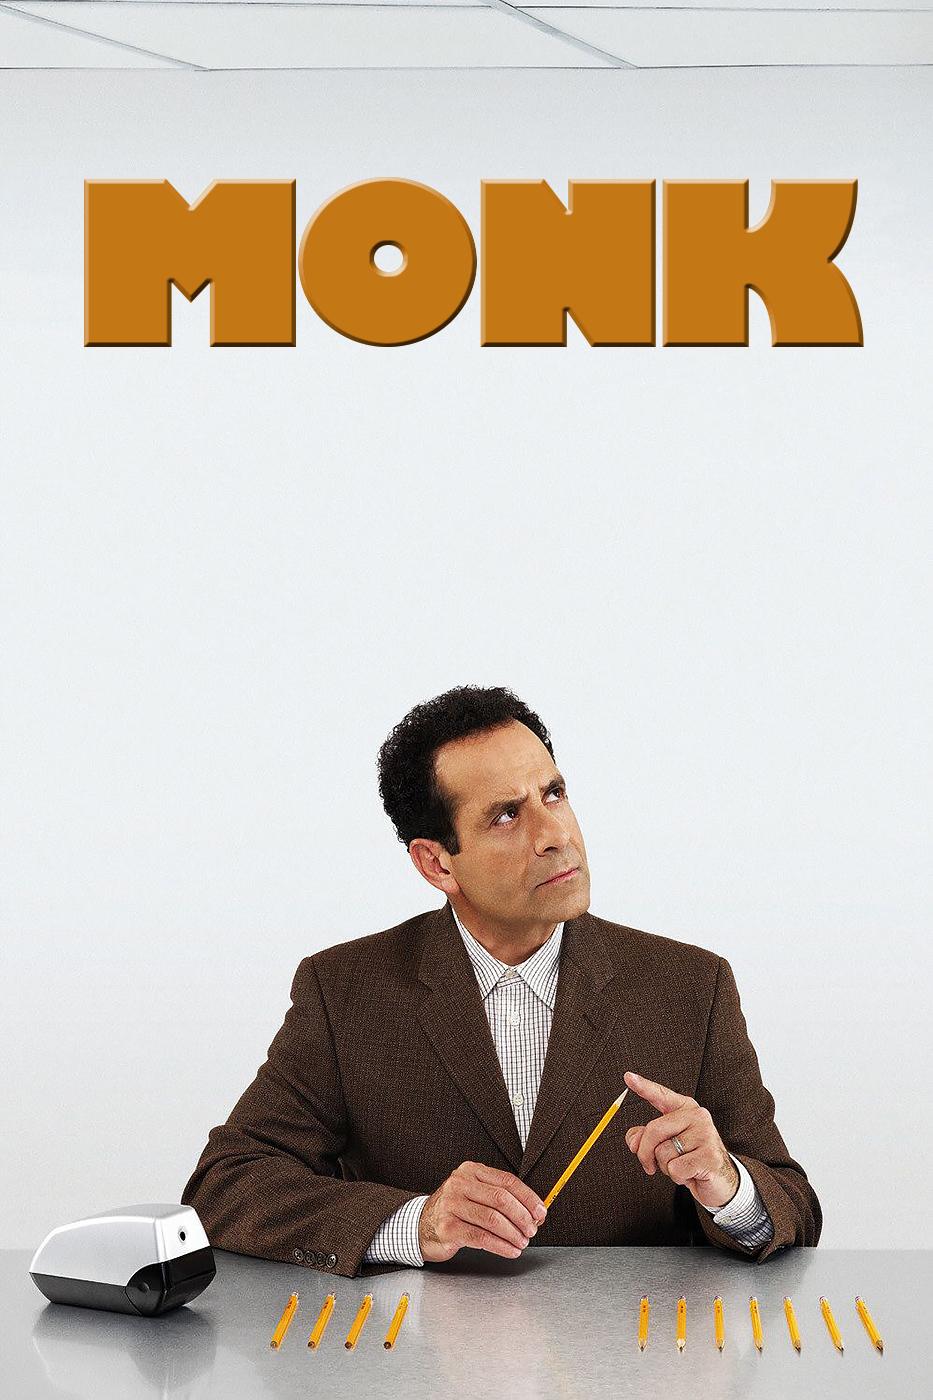 Monk - IMDbPro